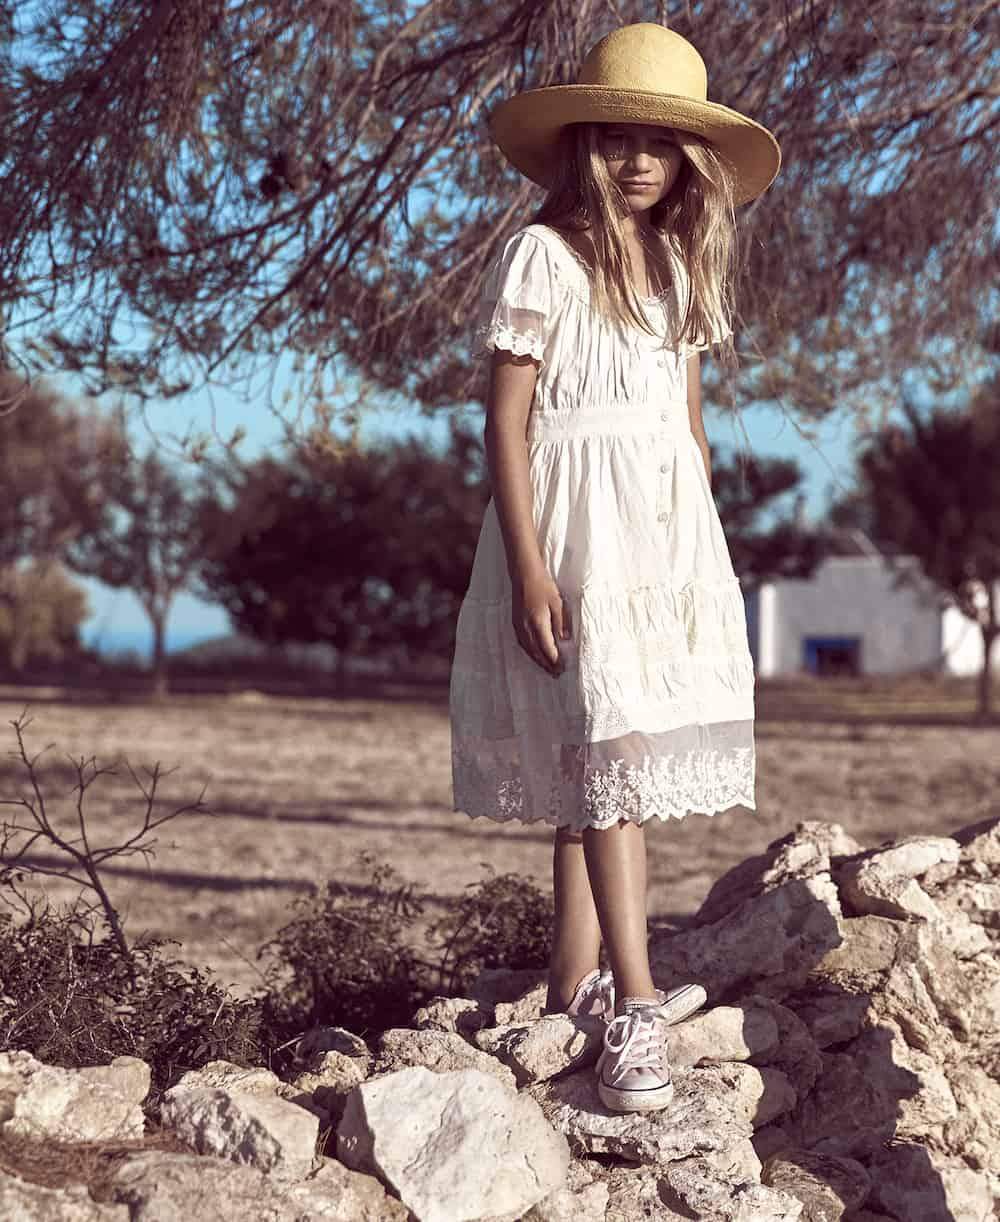 Zoe Adlersberg Earnshaw's shoot in Ibiza